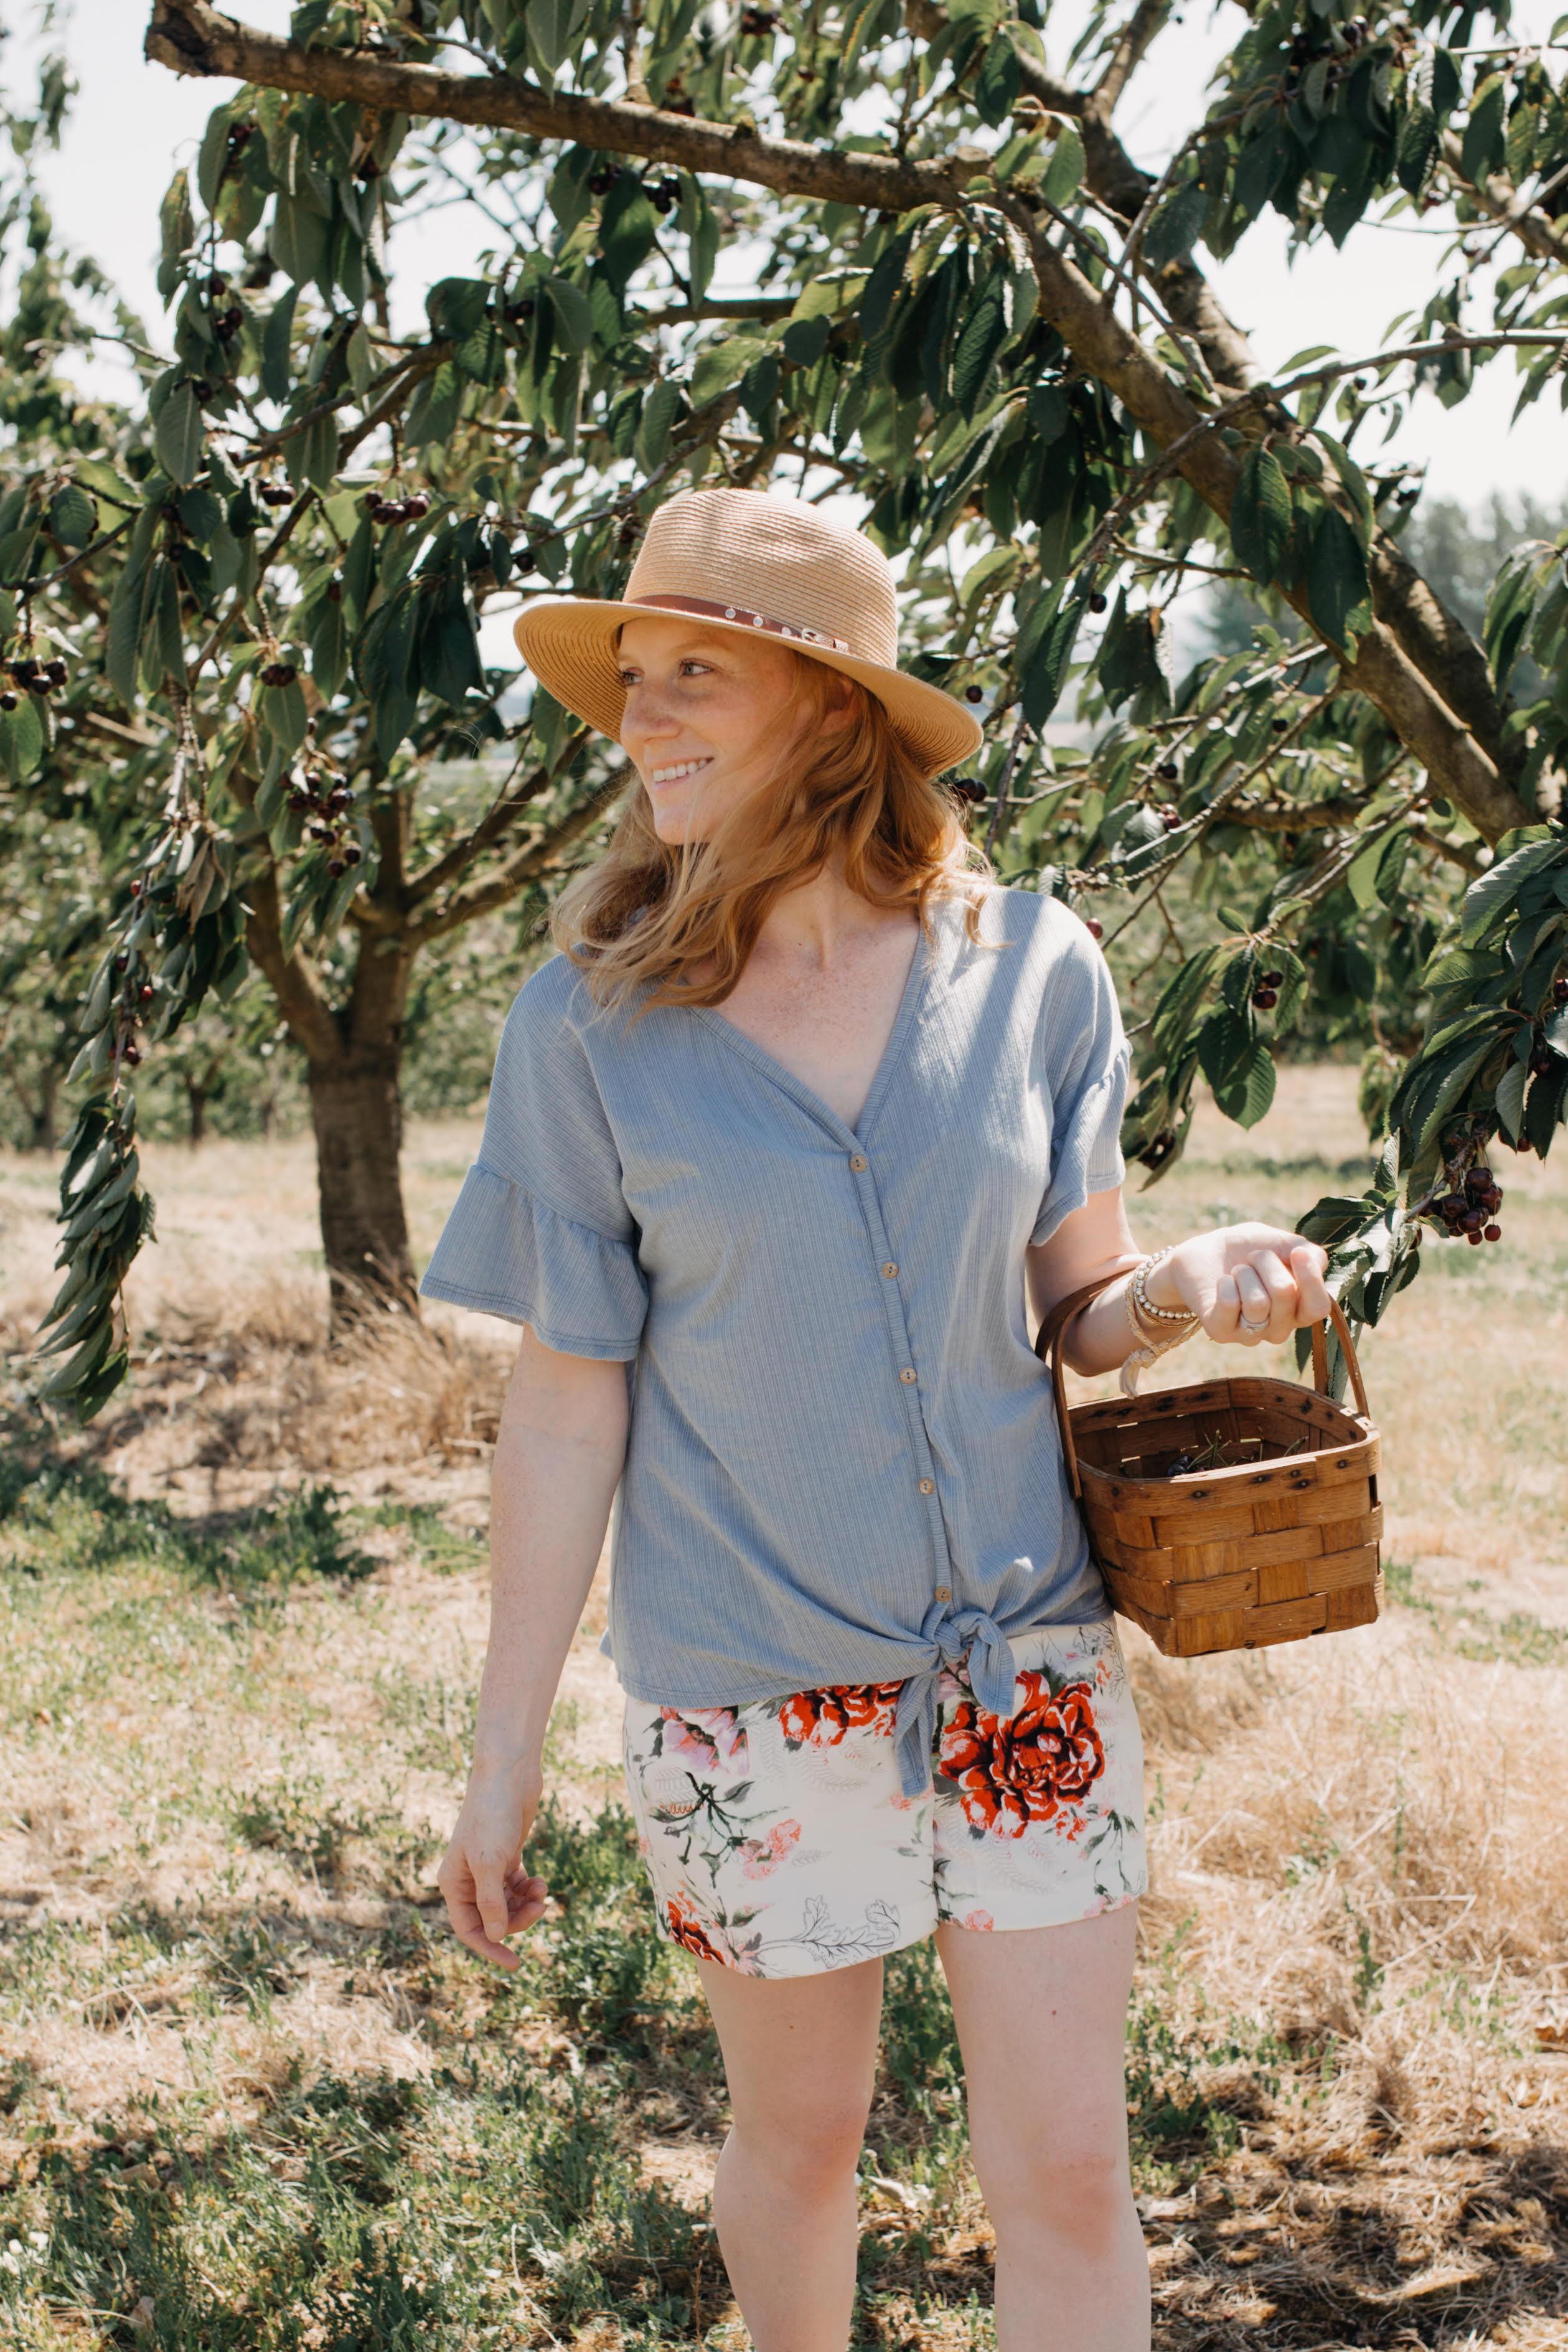 Meet the Author Madison Hoecker